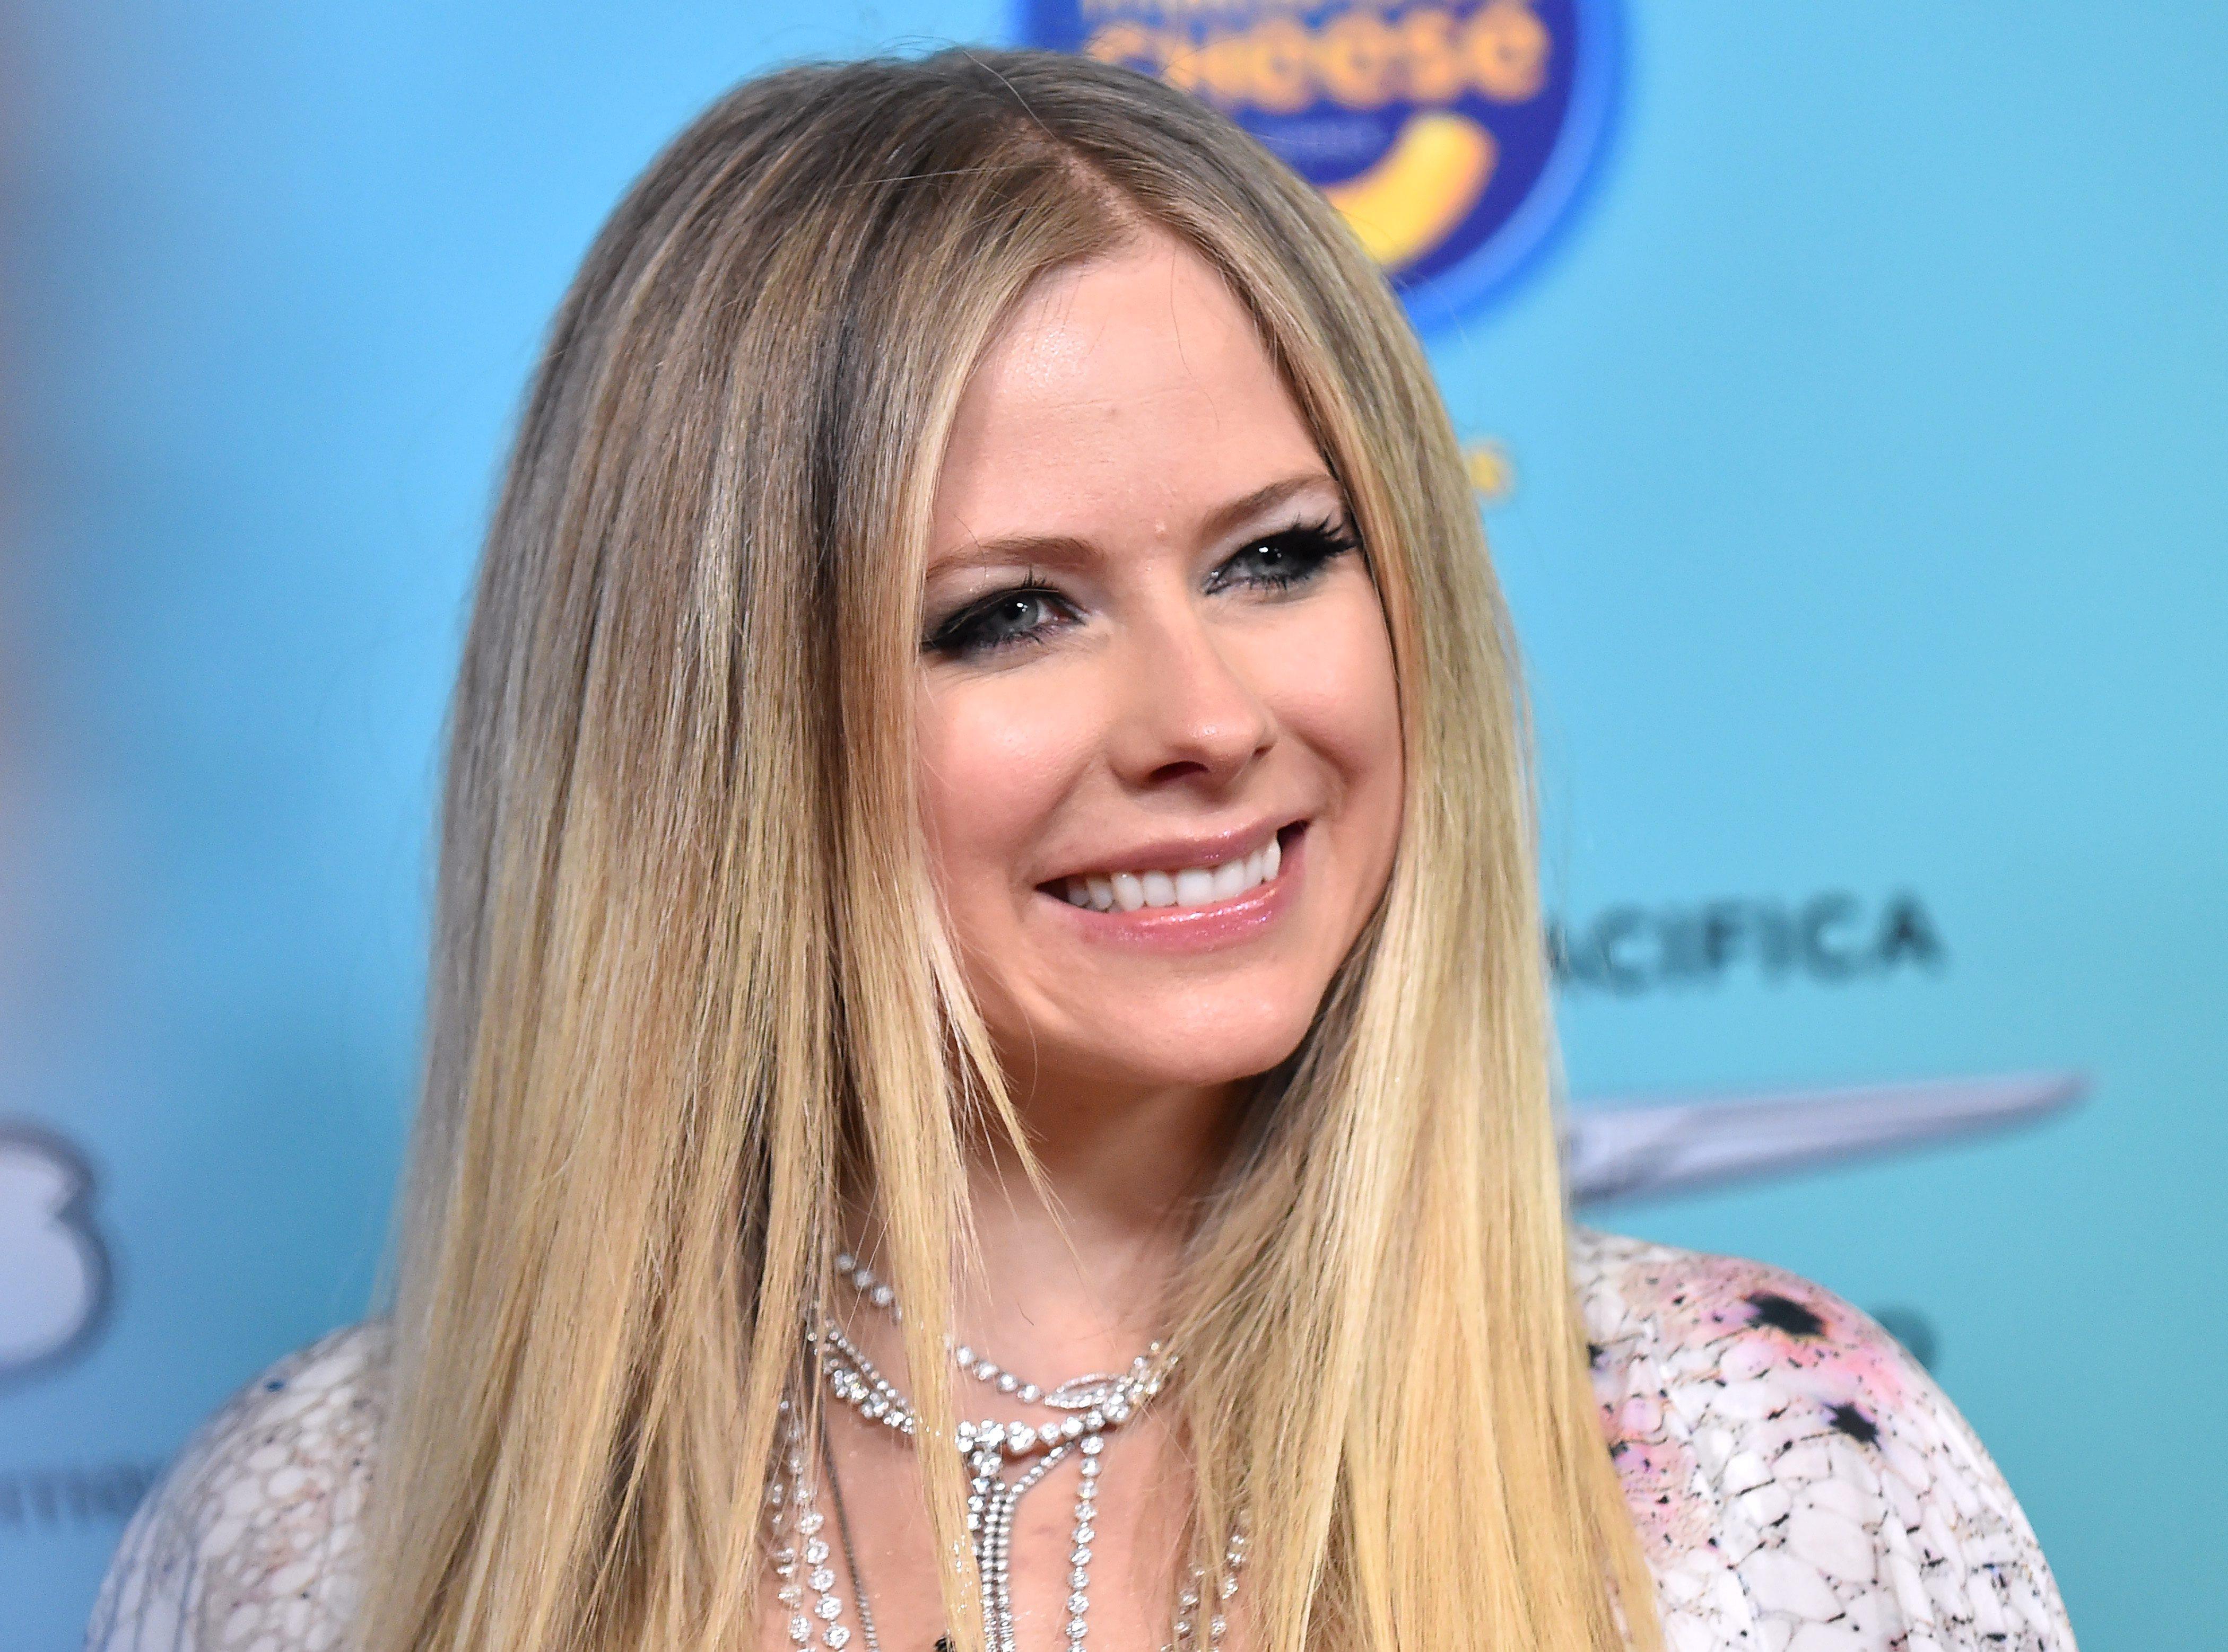 Avril Lavigne, Dua Lipa And More Join OHM Live's 24 Hour Livestream